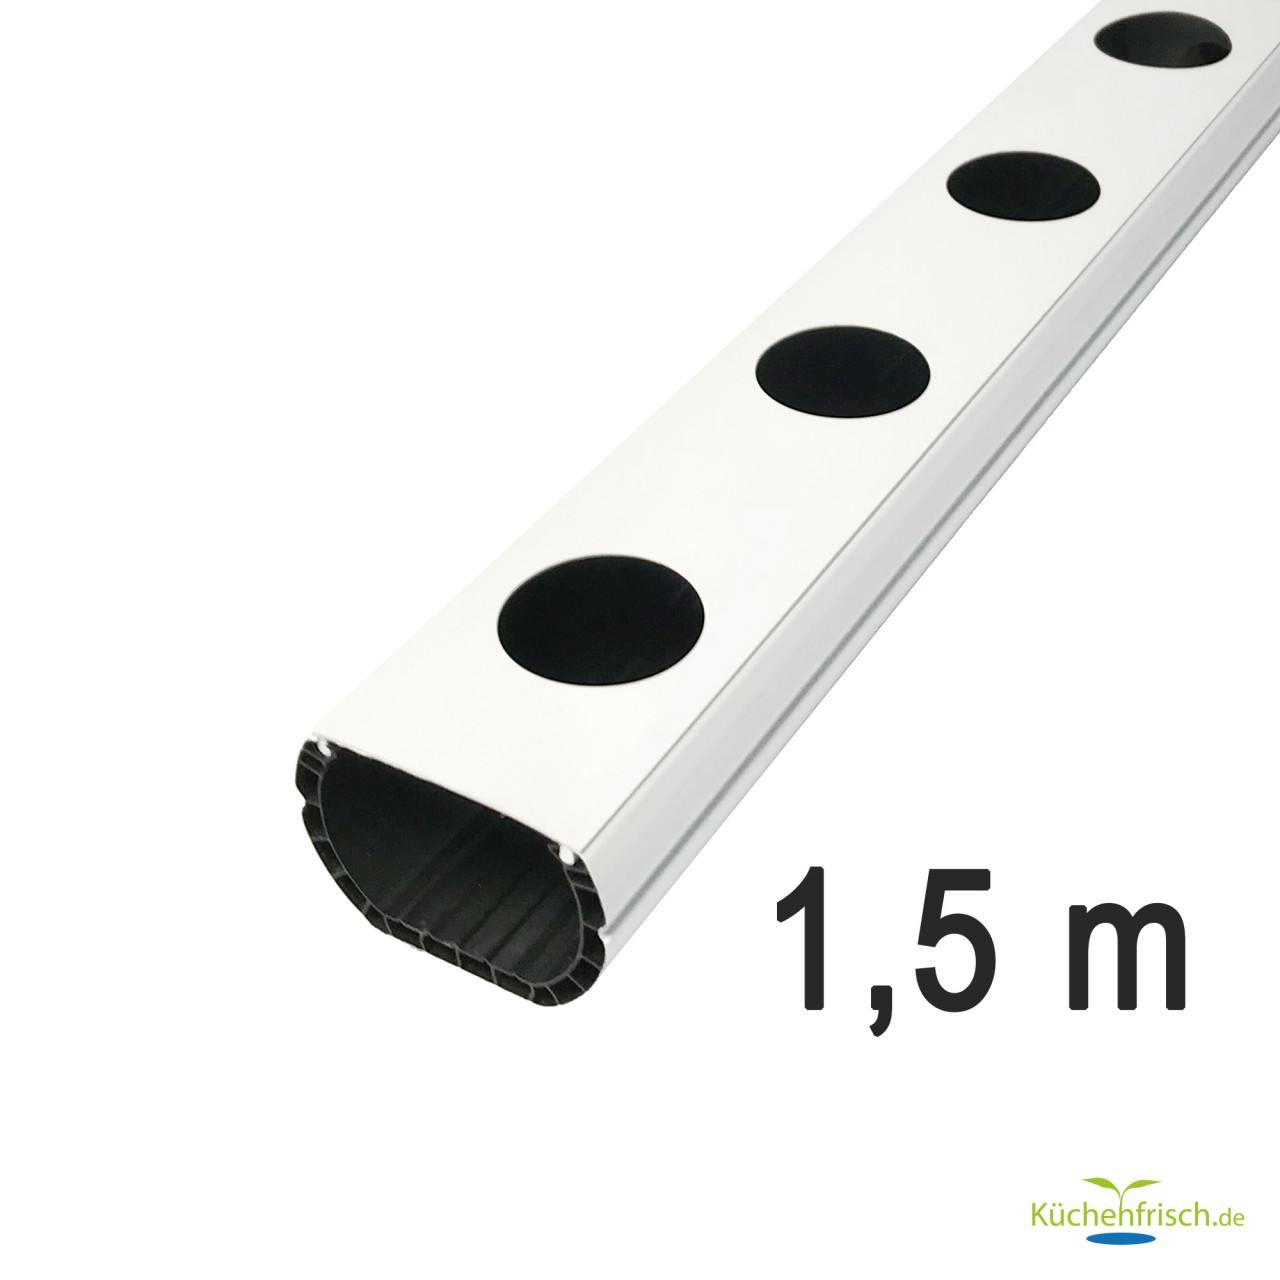 NFT Rinne 85 mm x 55 mm zweiteilig 1,5 m lang